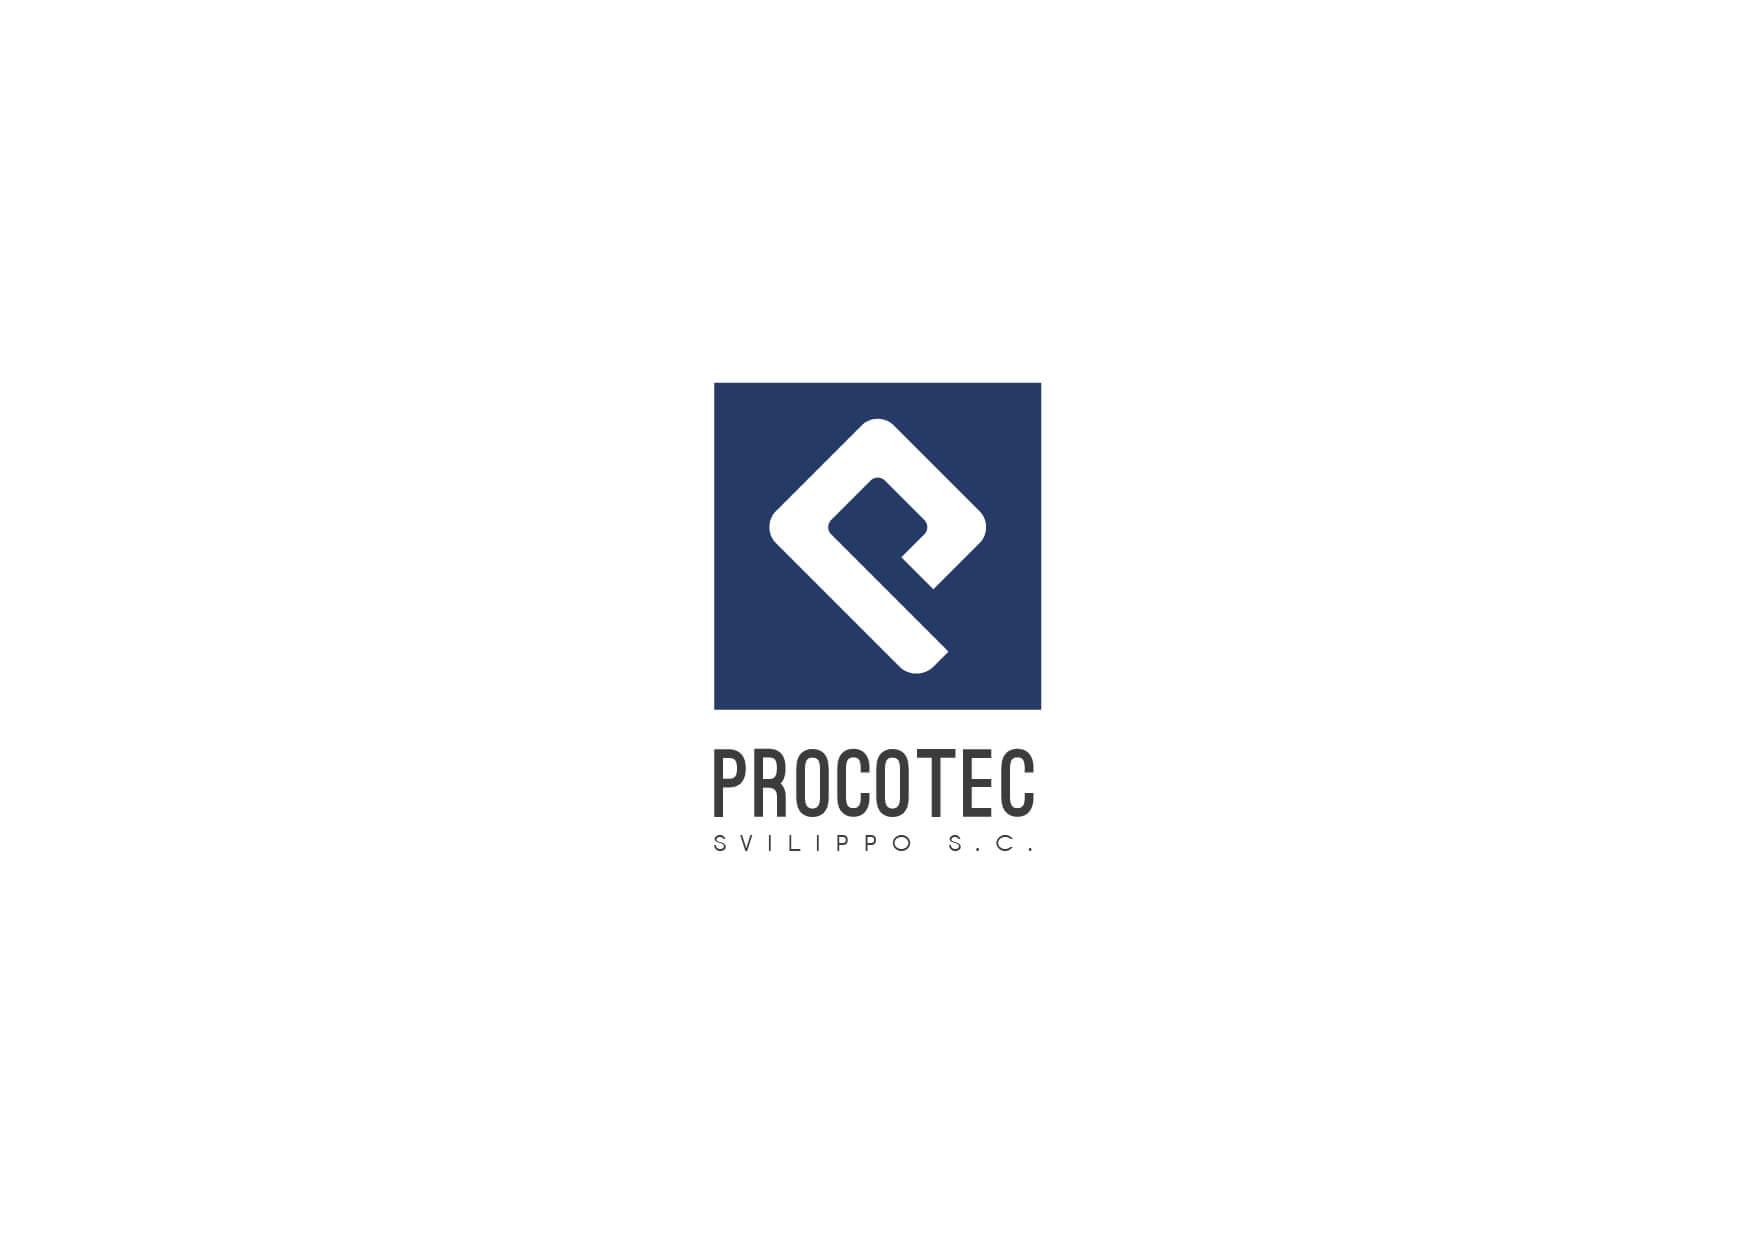 bbadv-mockup-procotec-logo-corporate-01